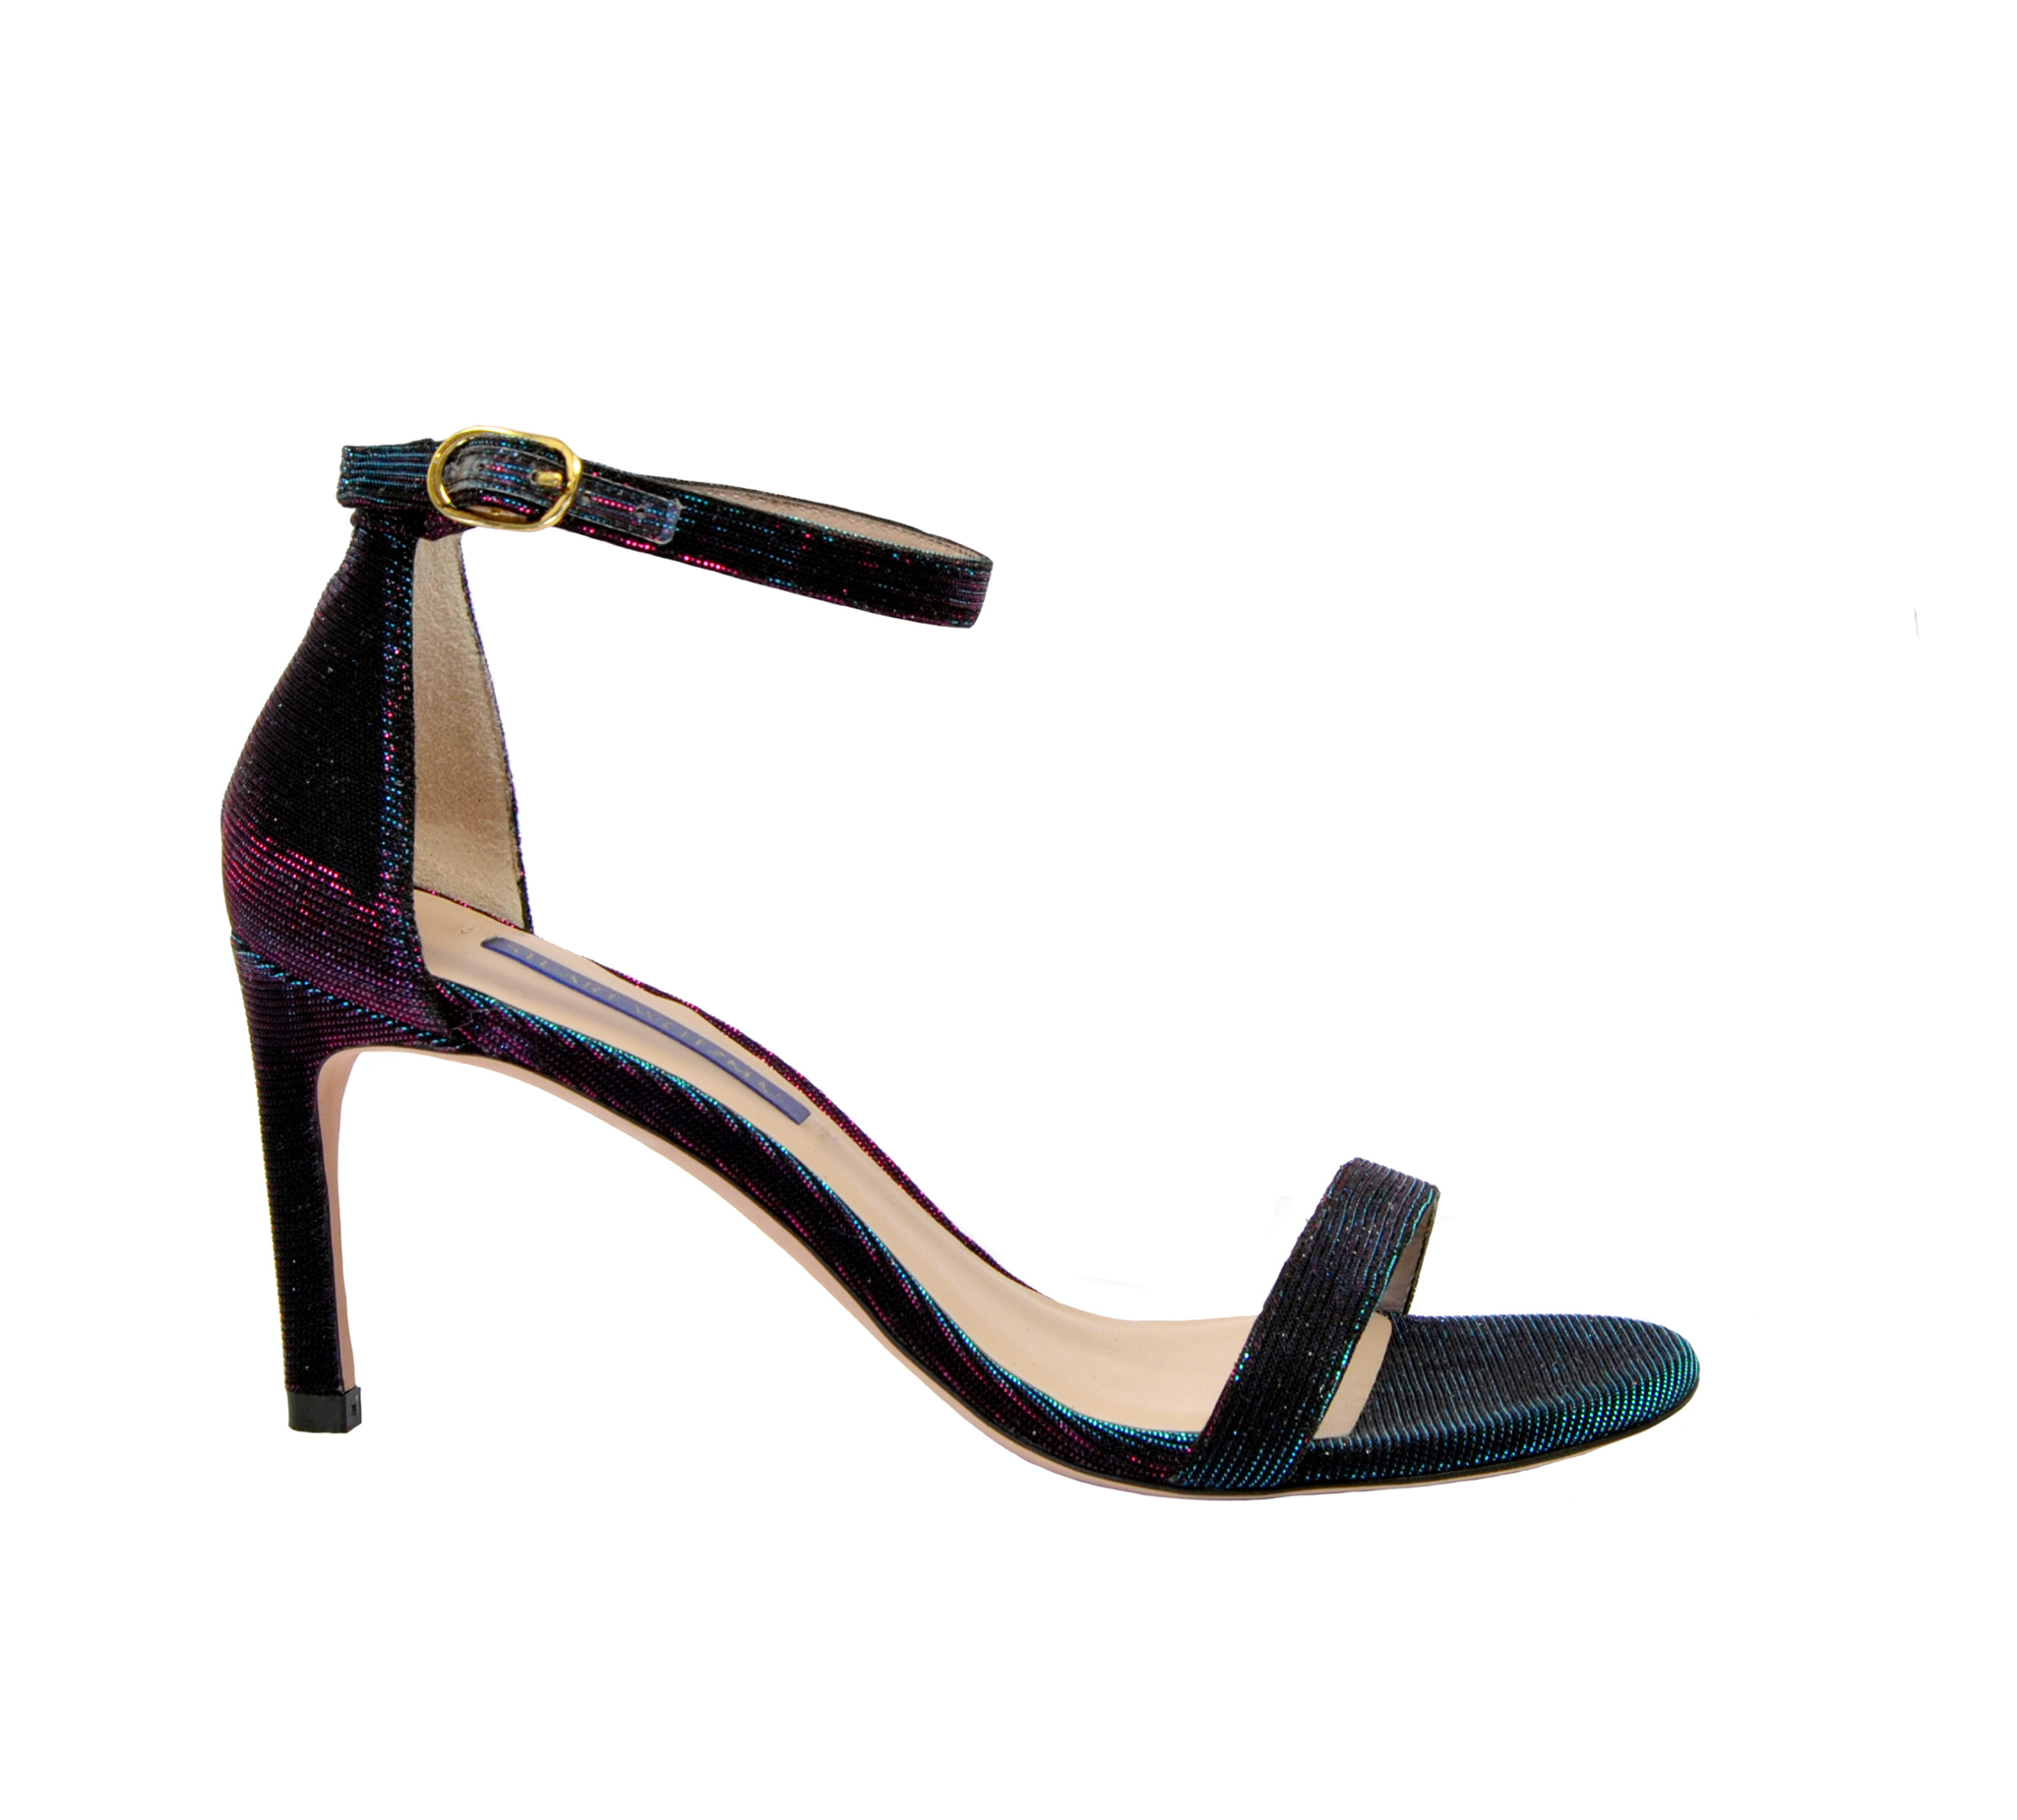 Semichiuso Semichiuso Semichiuso Donna Sandalo Sandalo Sandalo Donna Donna Sandalo 4AjRL5q3